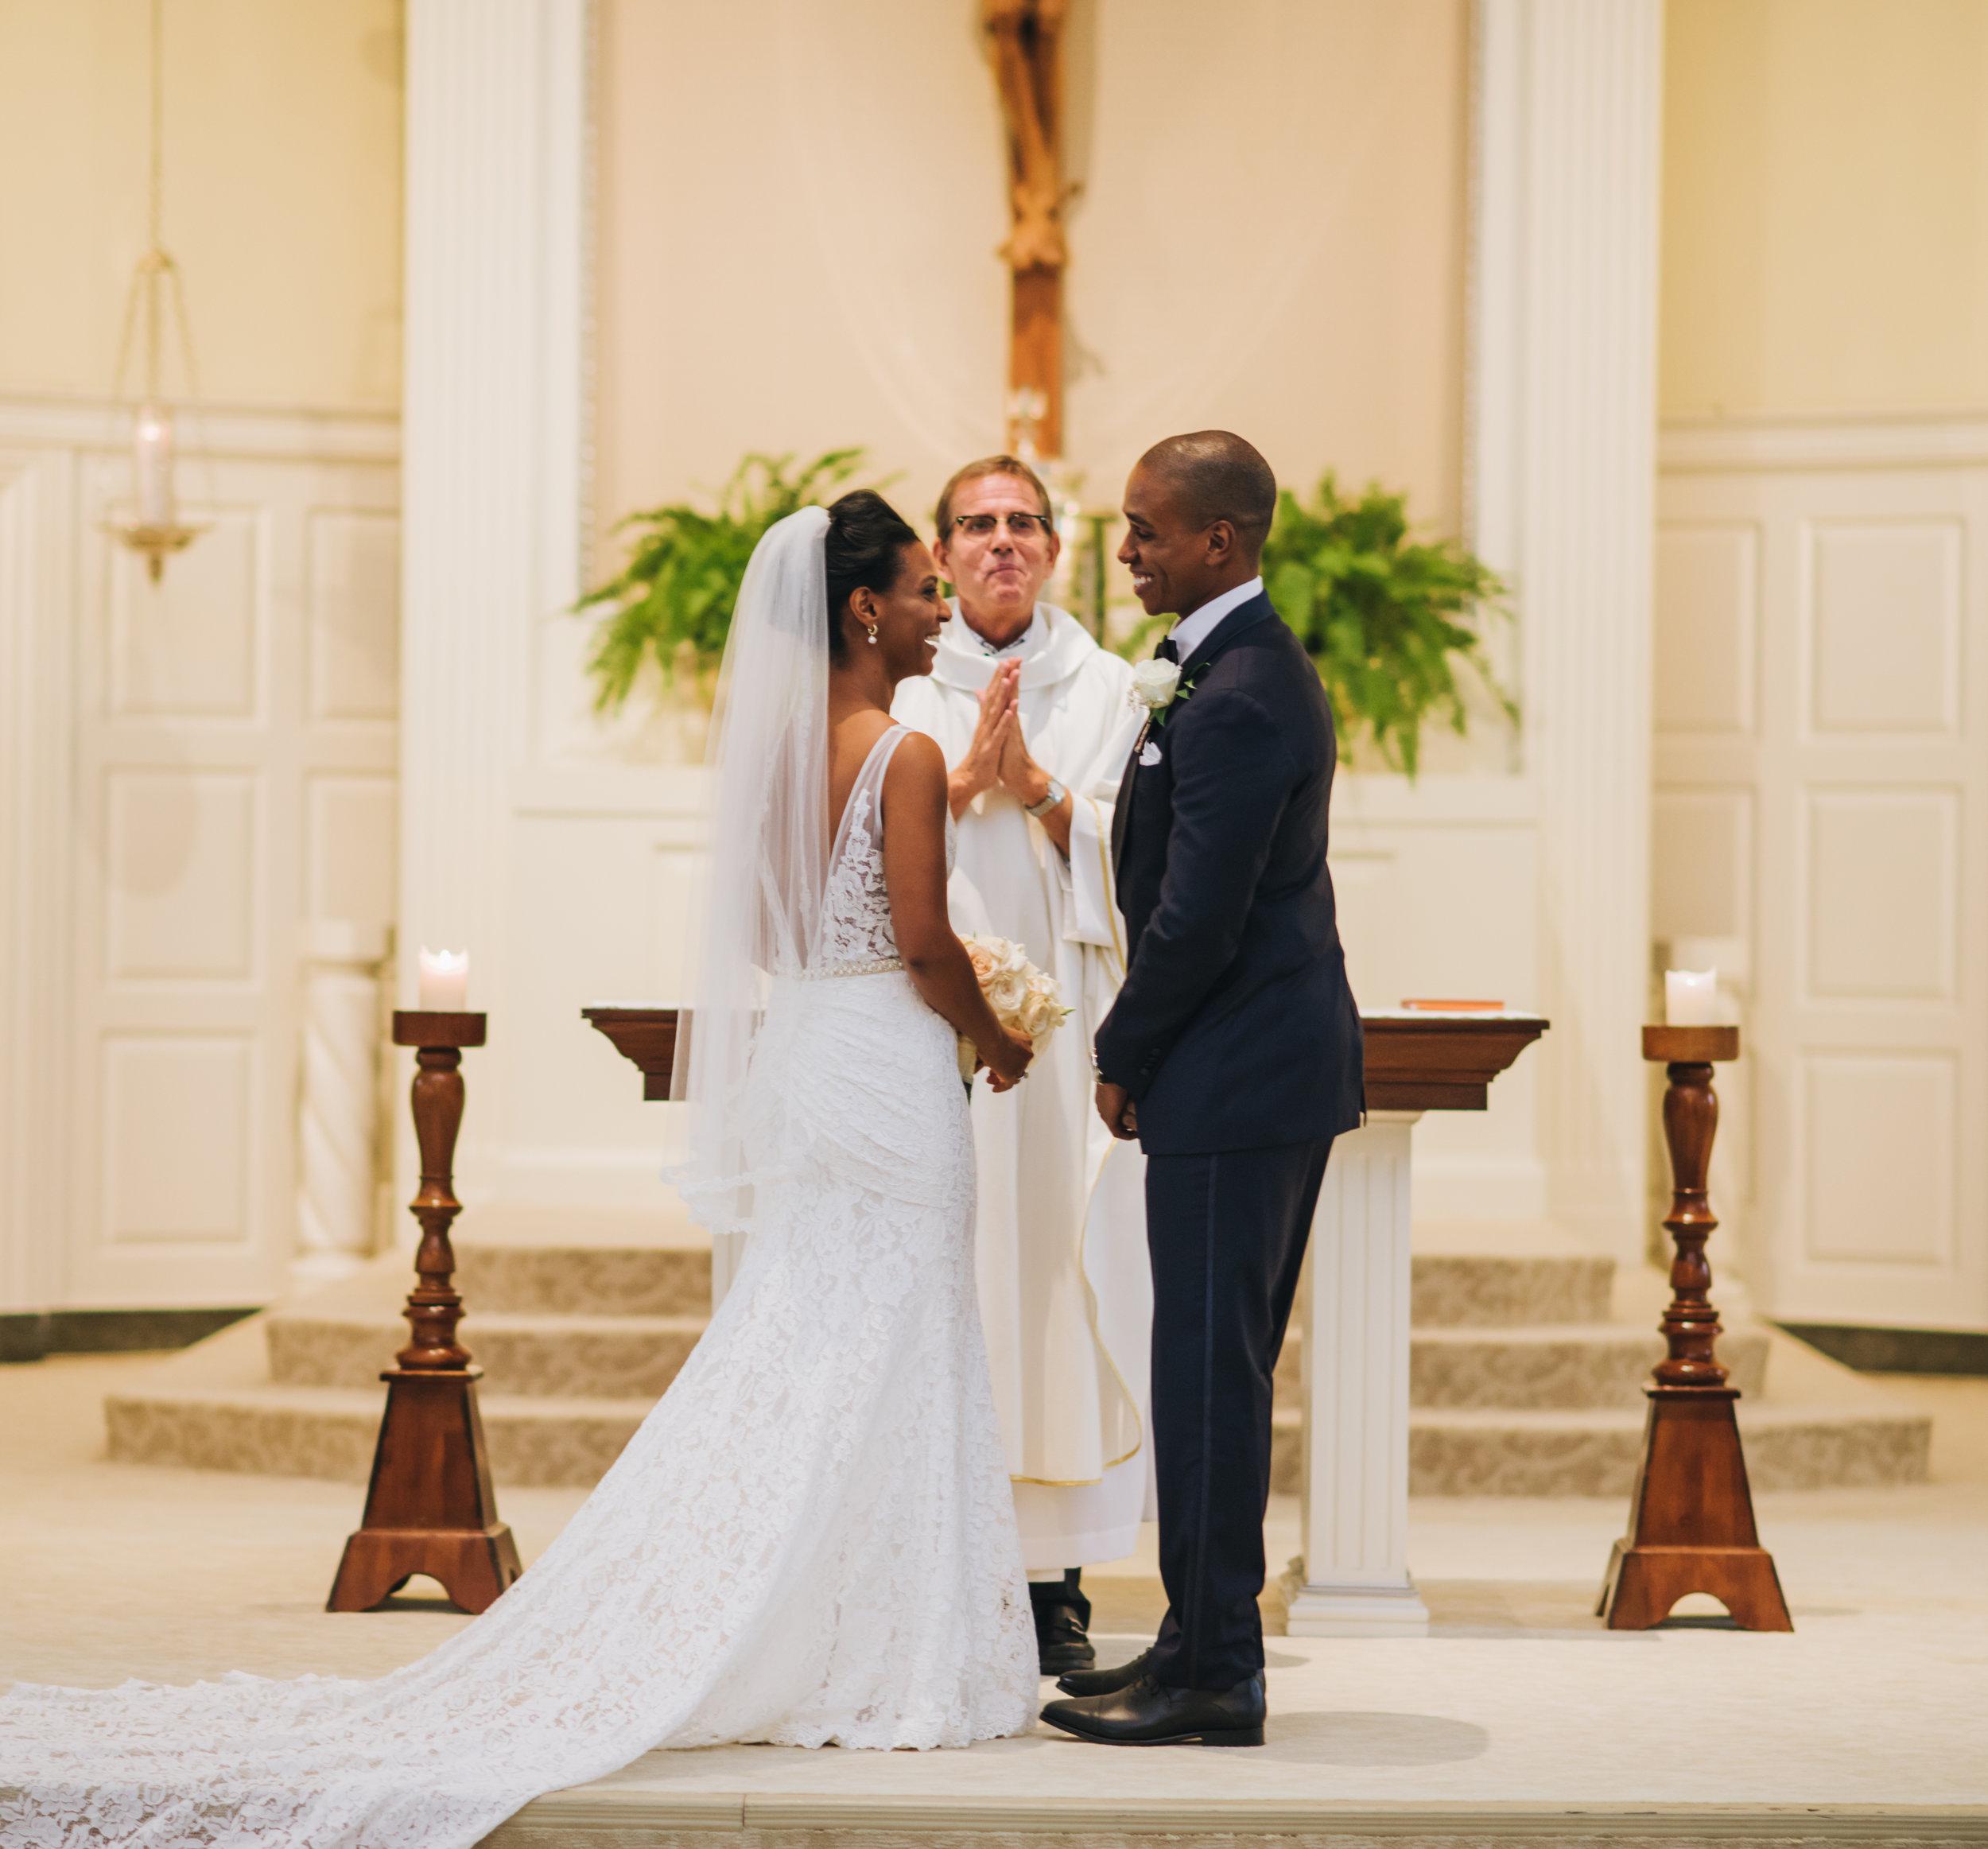 DANIELLE & BRANDON WEDDING - HEDGE ART GALLERY - NYC INTIMATE WEDDING PHOTOGRAPHER - CHI-CHI ARI-223.jpg